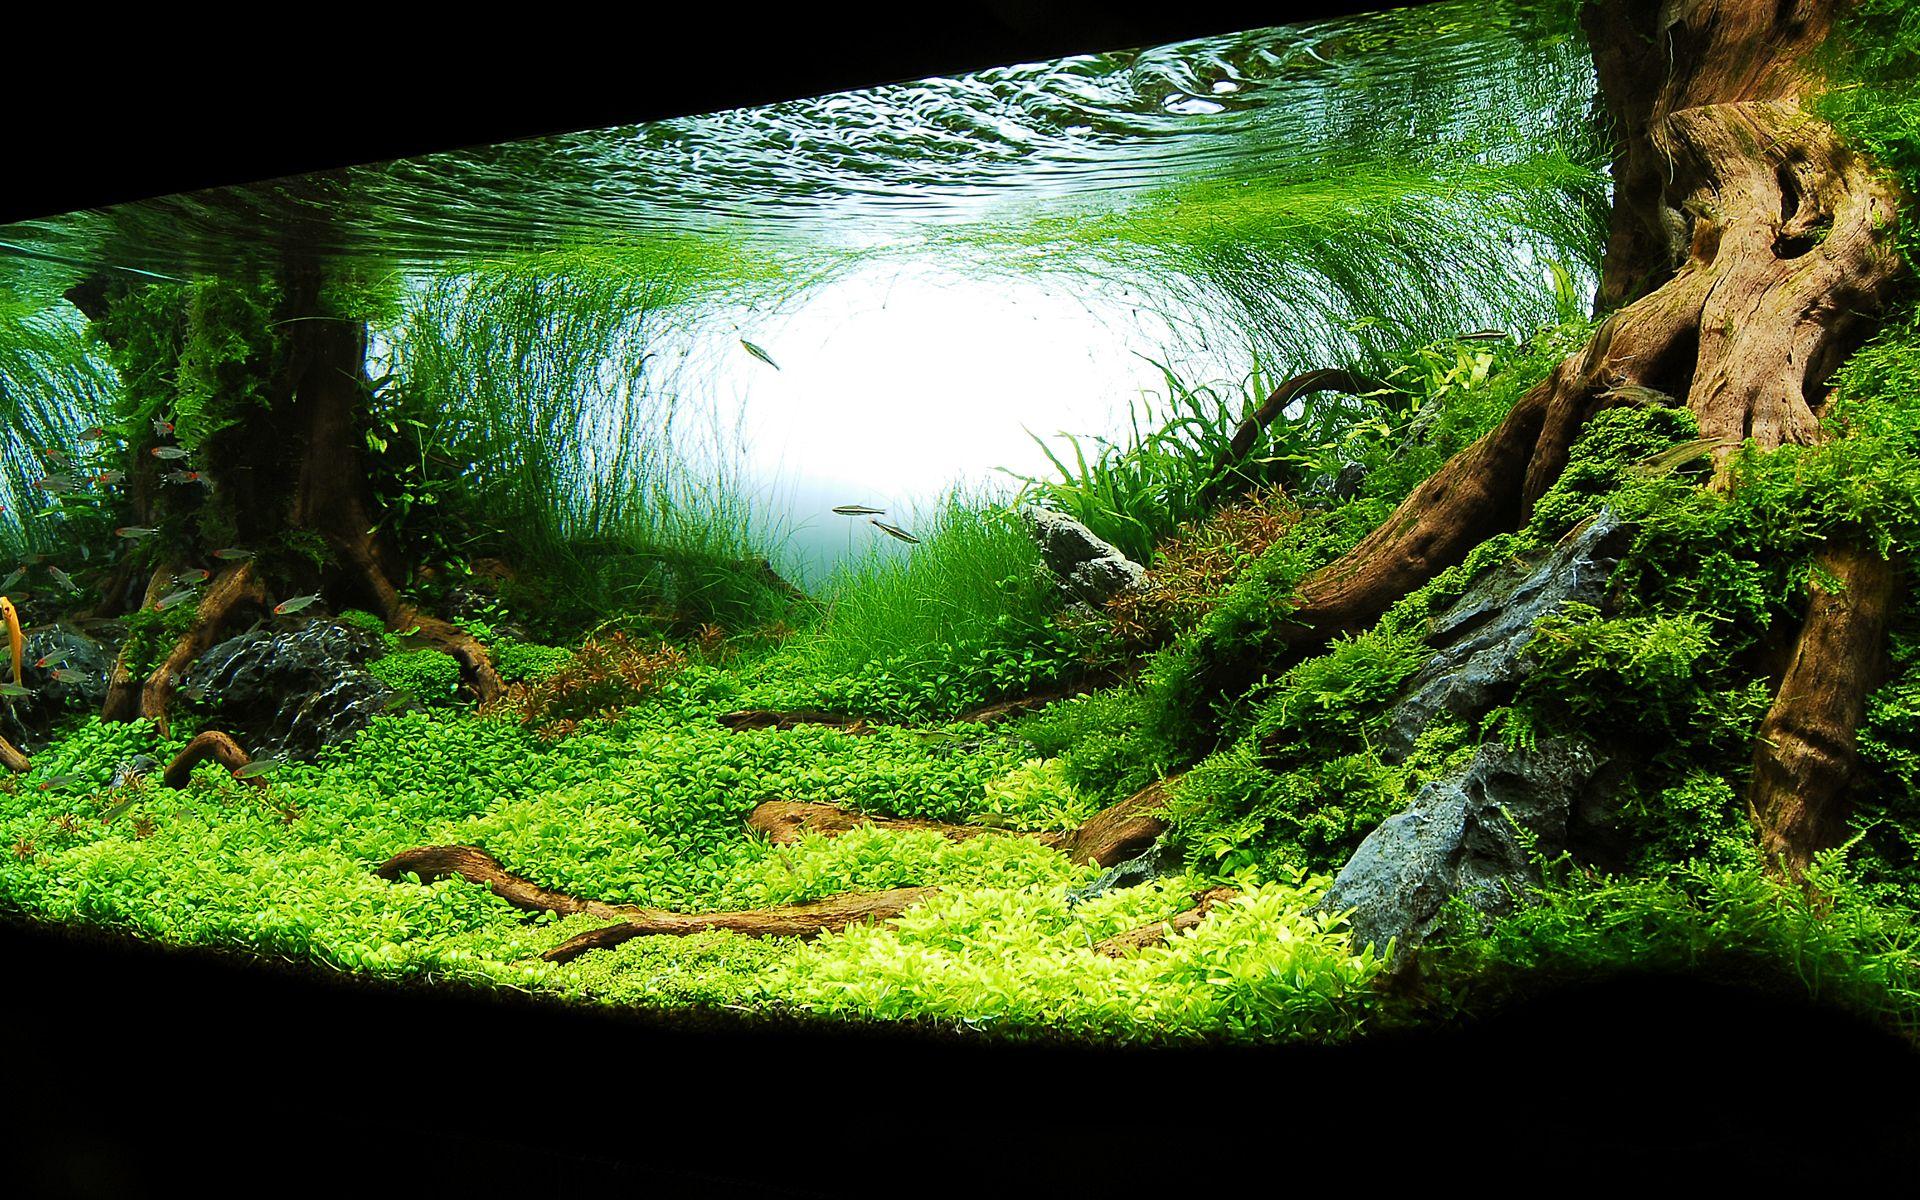 Pin by Ovidiu Drobotă on WallPapers | Aquarium, Freshwater aquarium, Planted aquarium